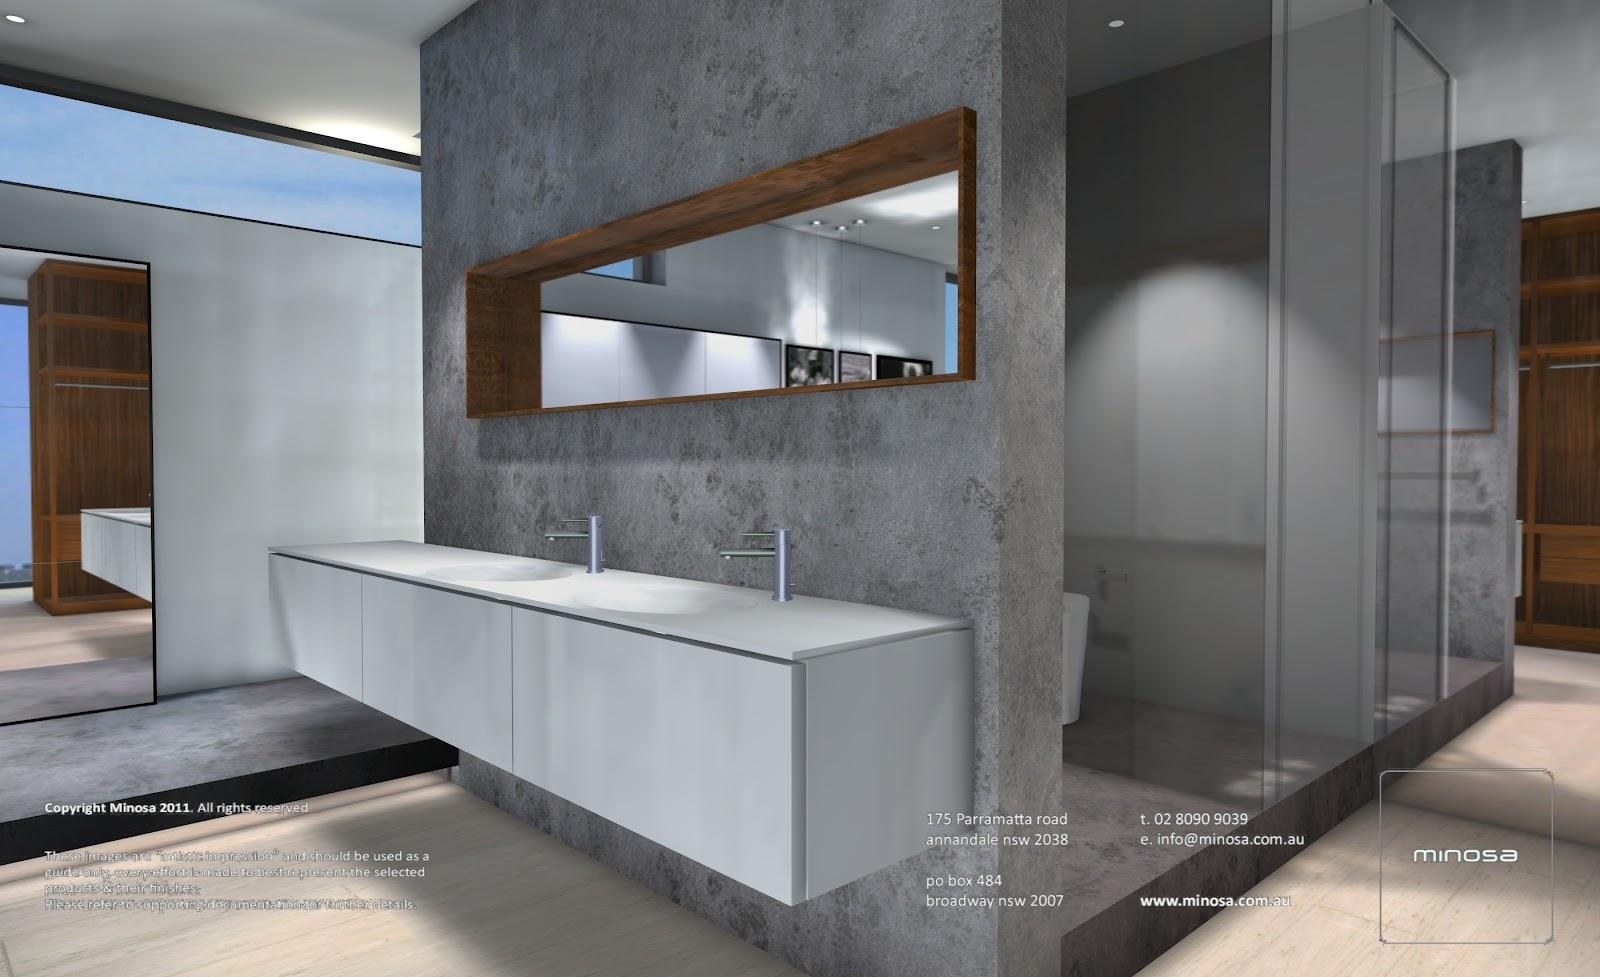 Bathroom Plans: Minosa: Bathroom Washbasins